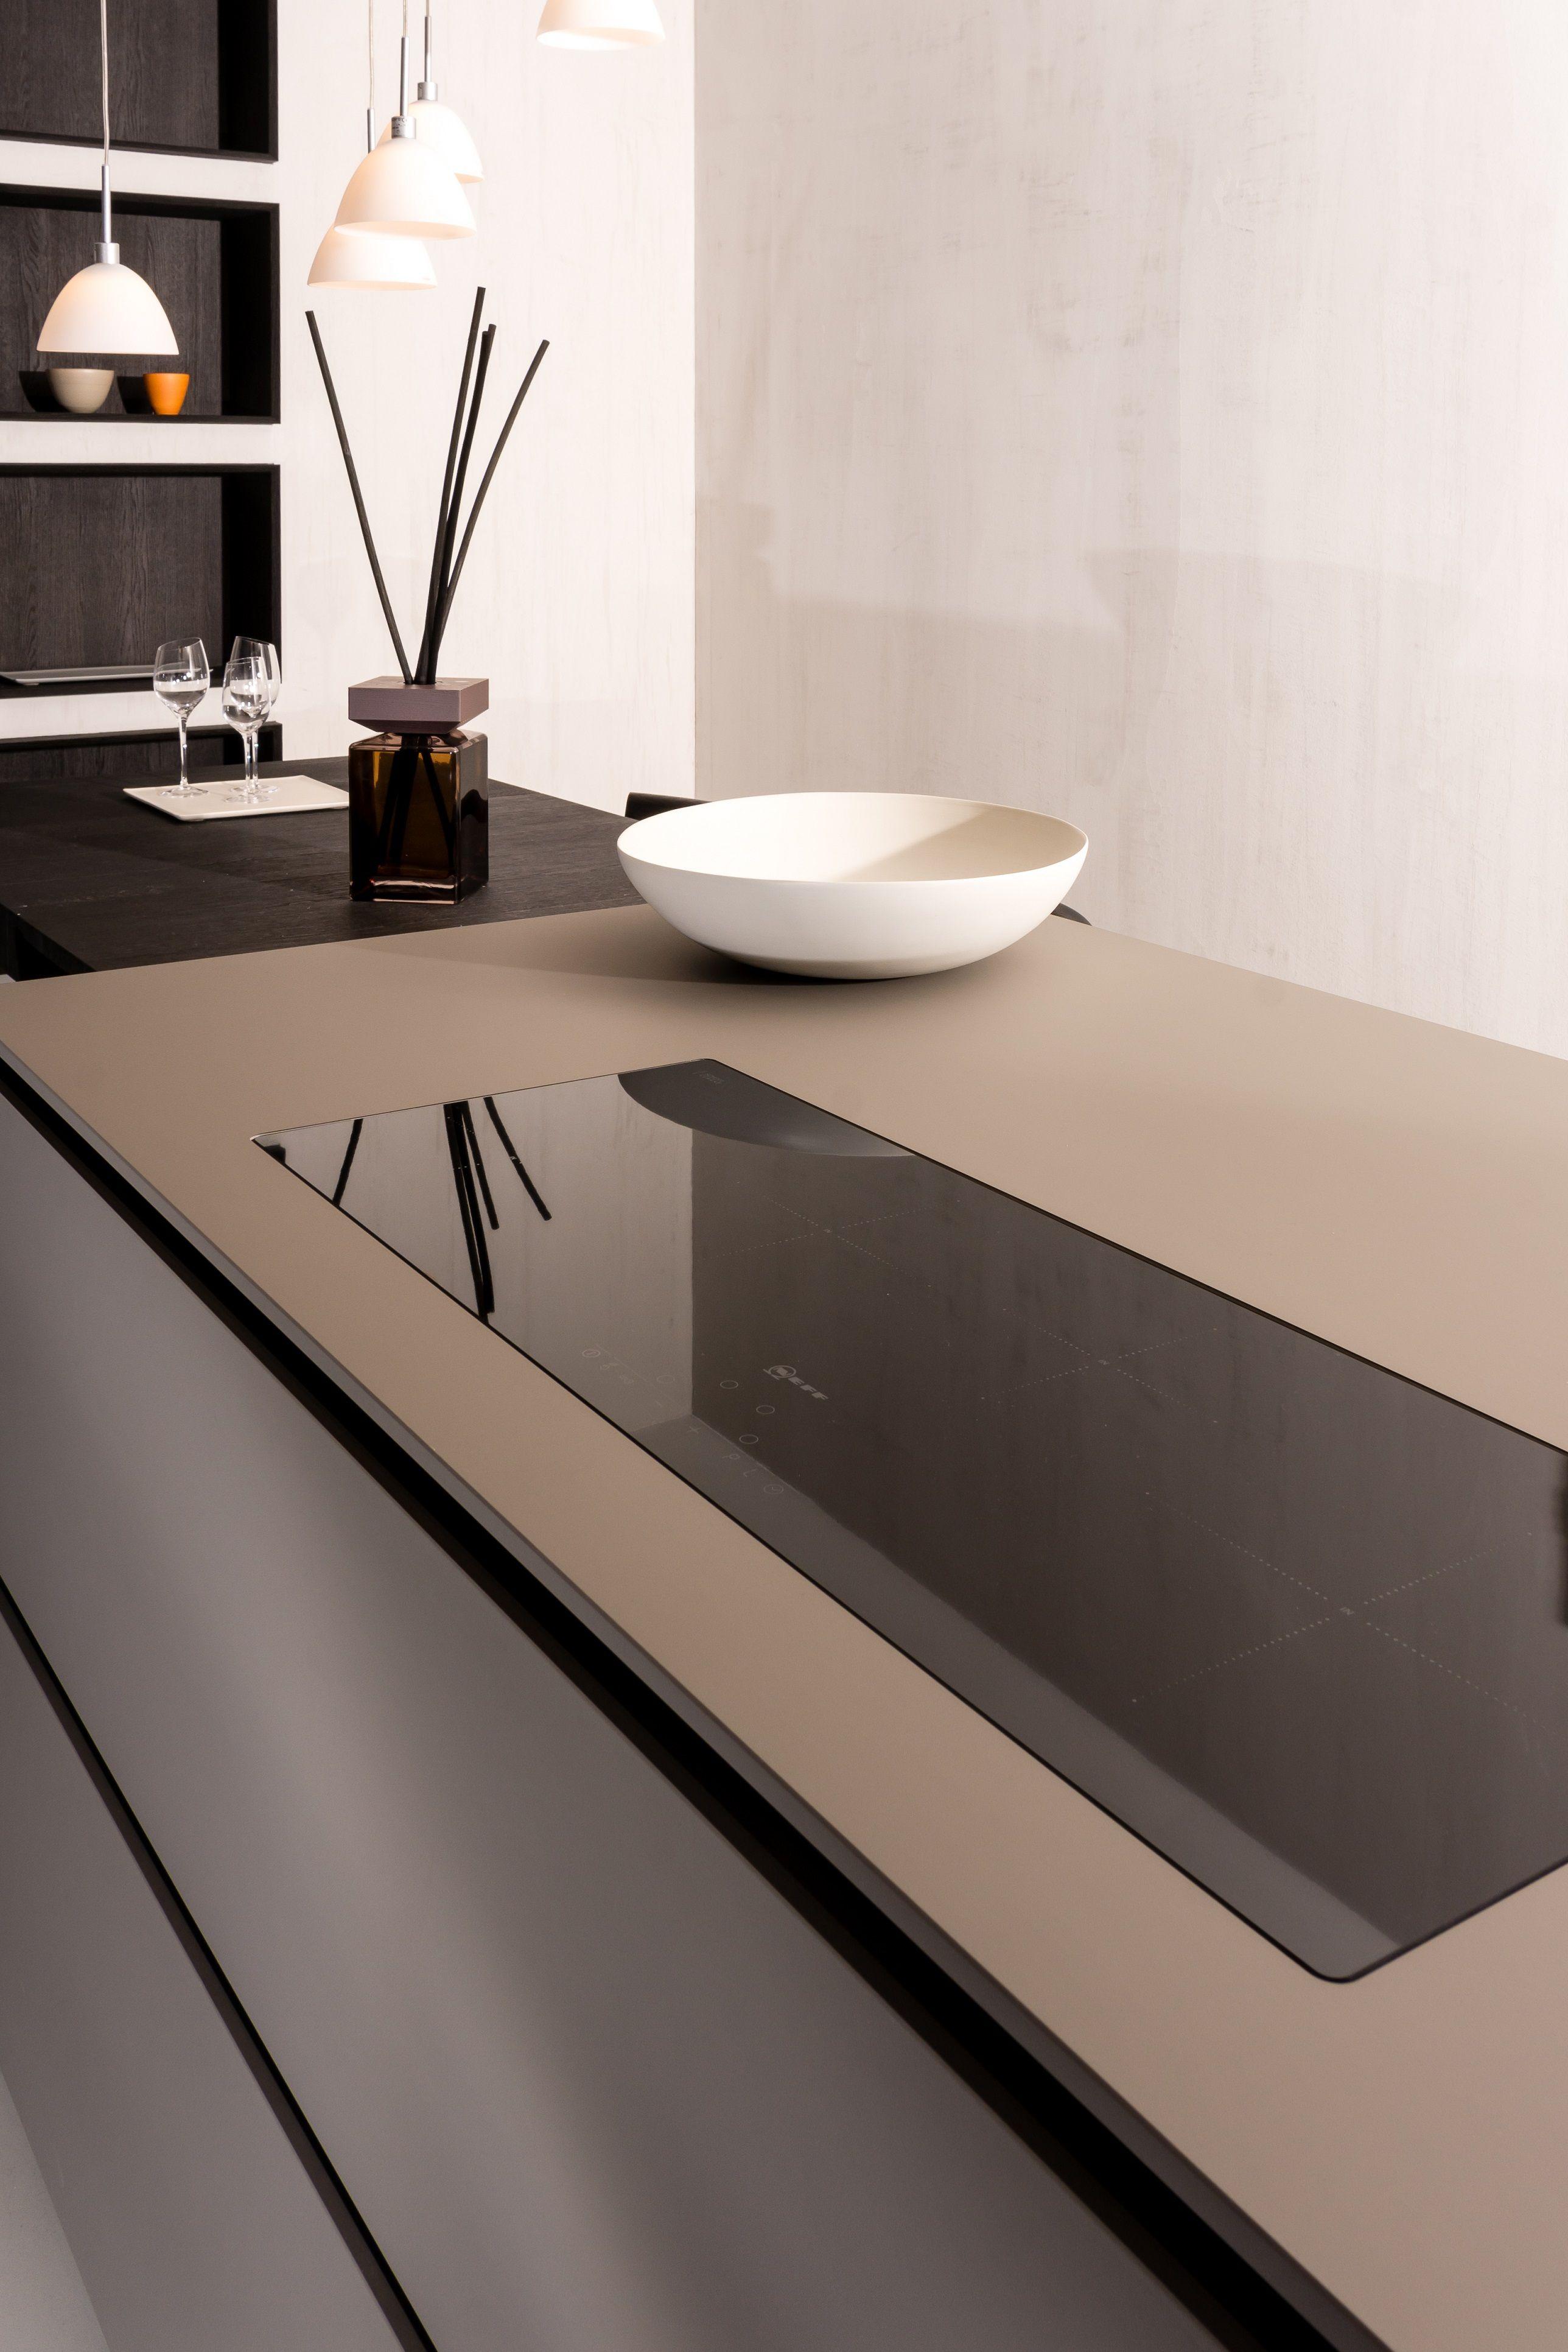 The Super Matte Surface Of Fenix Ntm Is Durable And Looks Great In Any Modern Kitchen Design Keuken Design Keukens Keuken Inspiratie